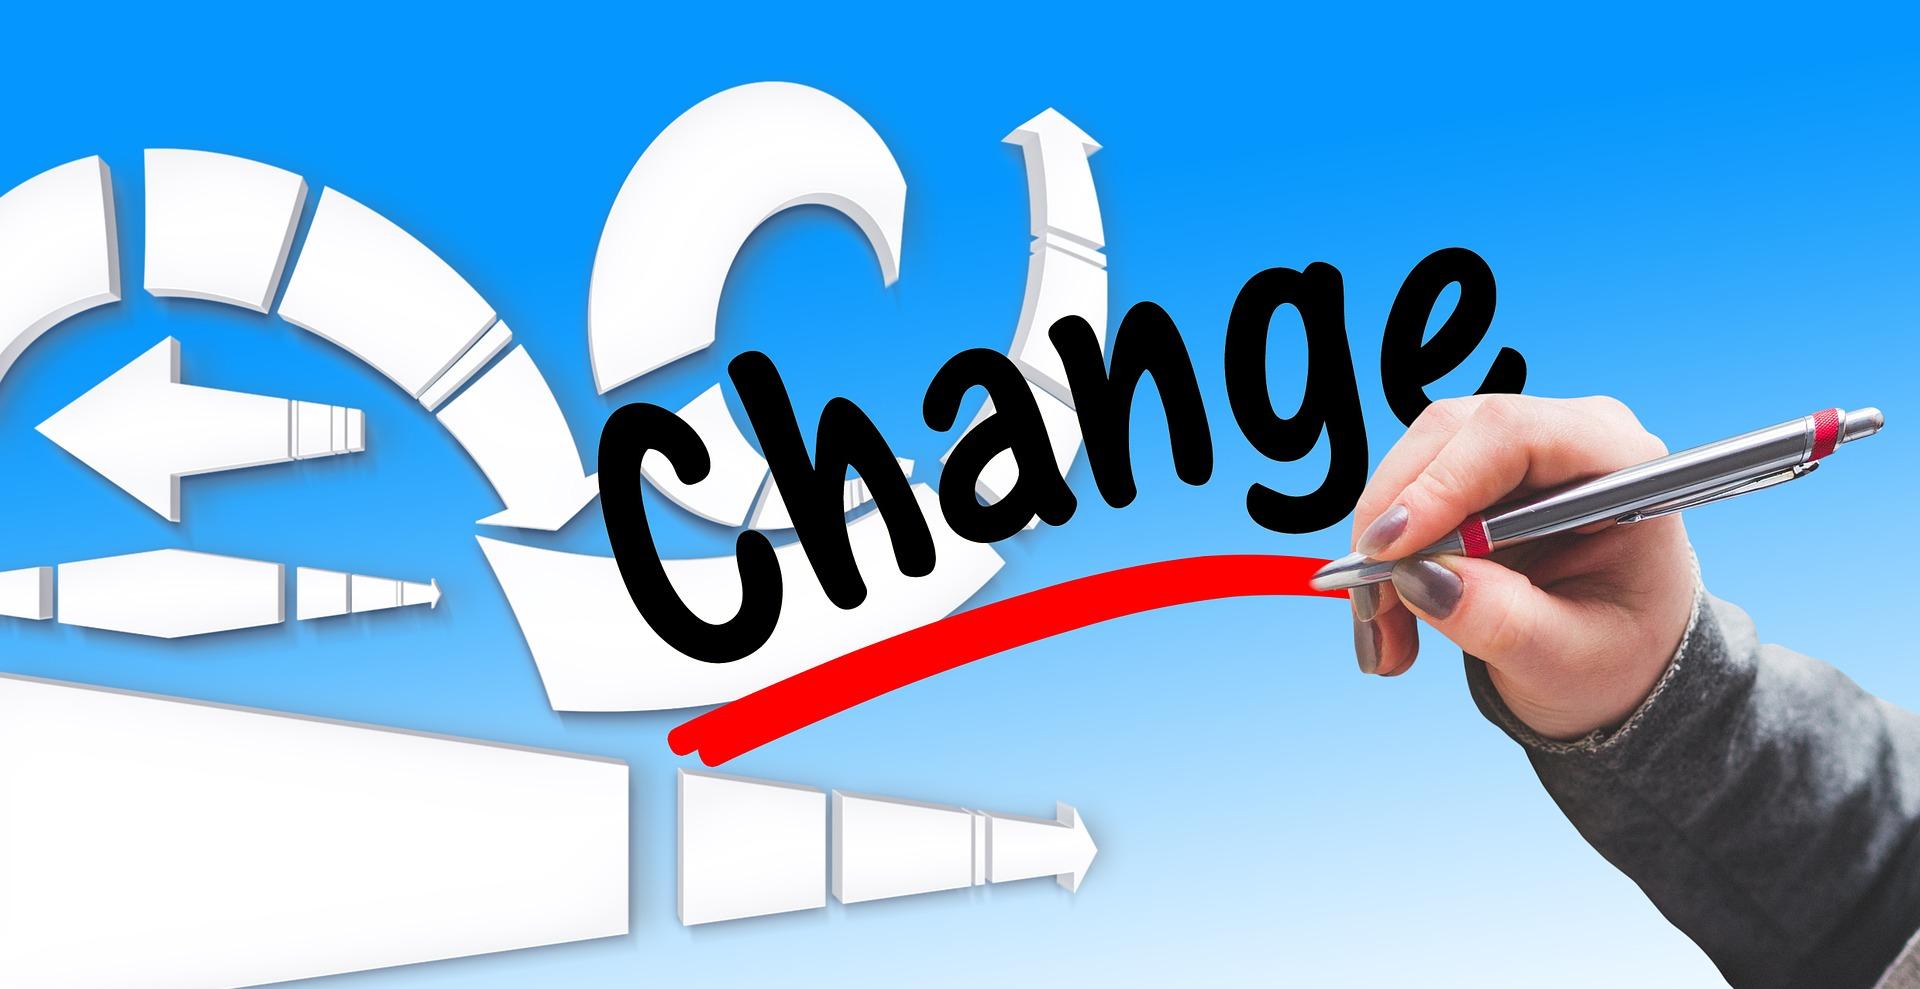 change-1076218_1920